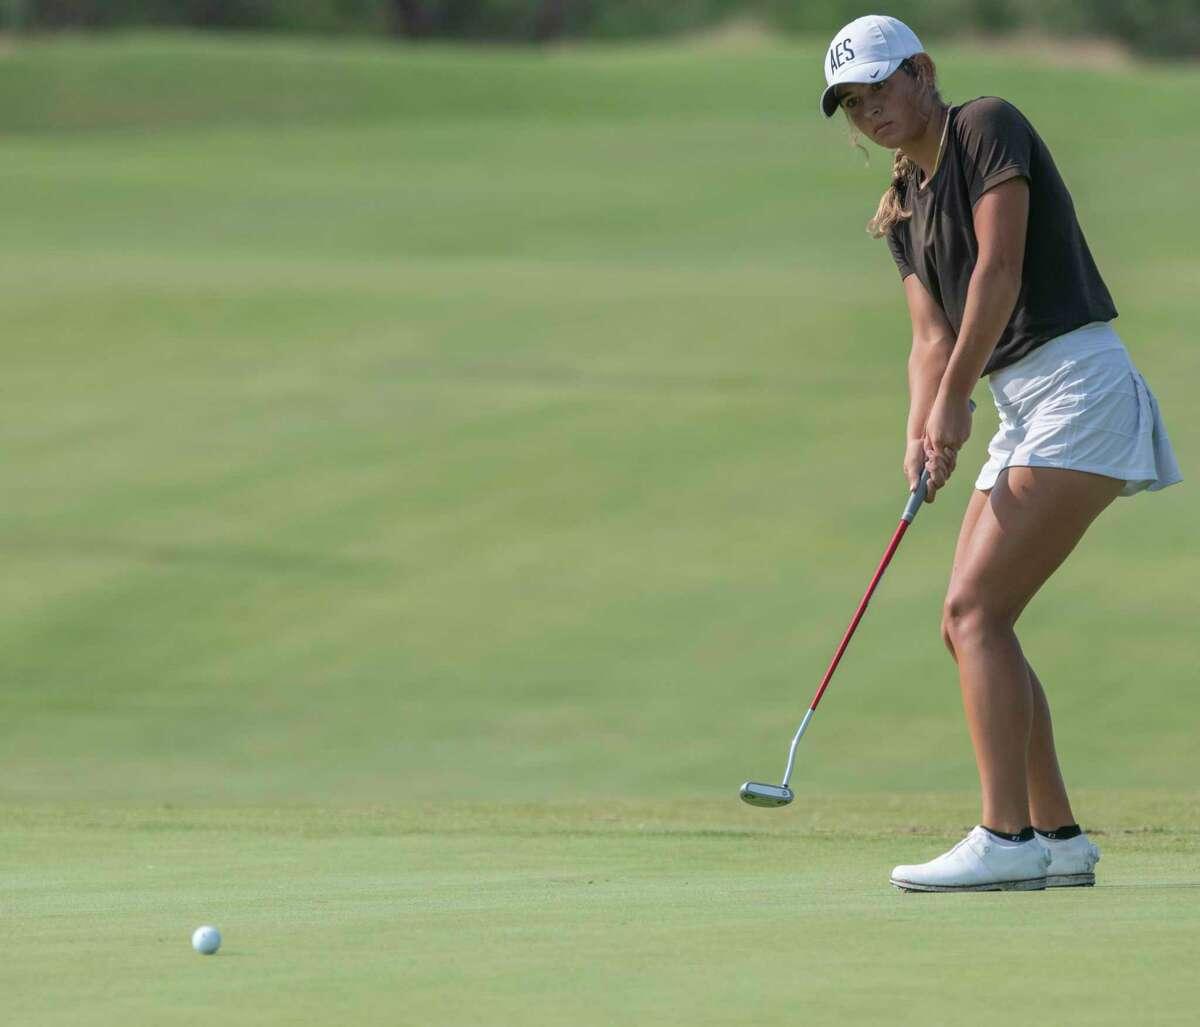 Alexandra Escamilla follows her putt 07/20/2021 during the first round of the Midland Women's City Golf Tournament at Midland Country Club. Tim Fischer/Reporter-Telegram